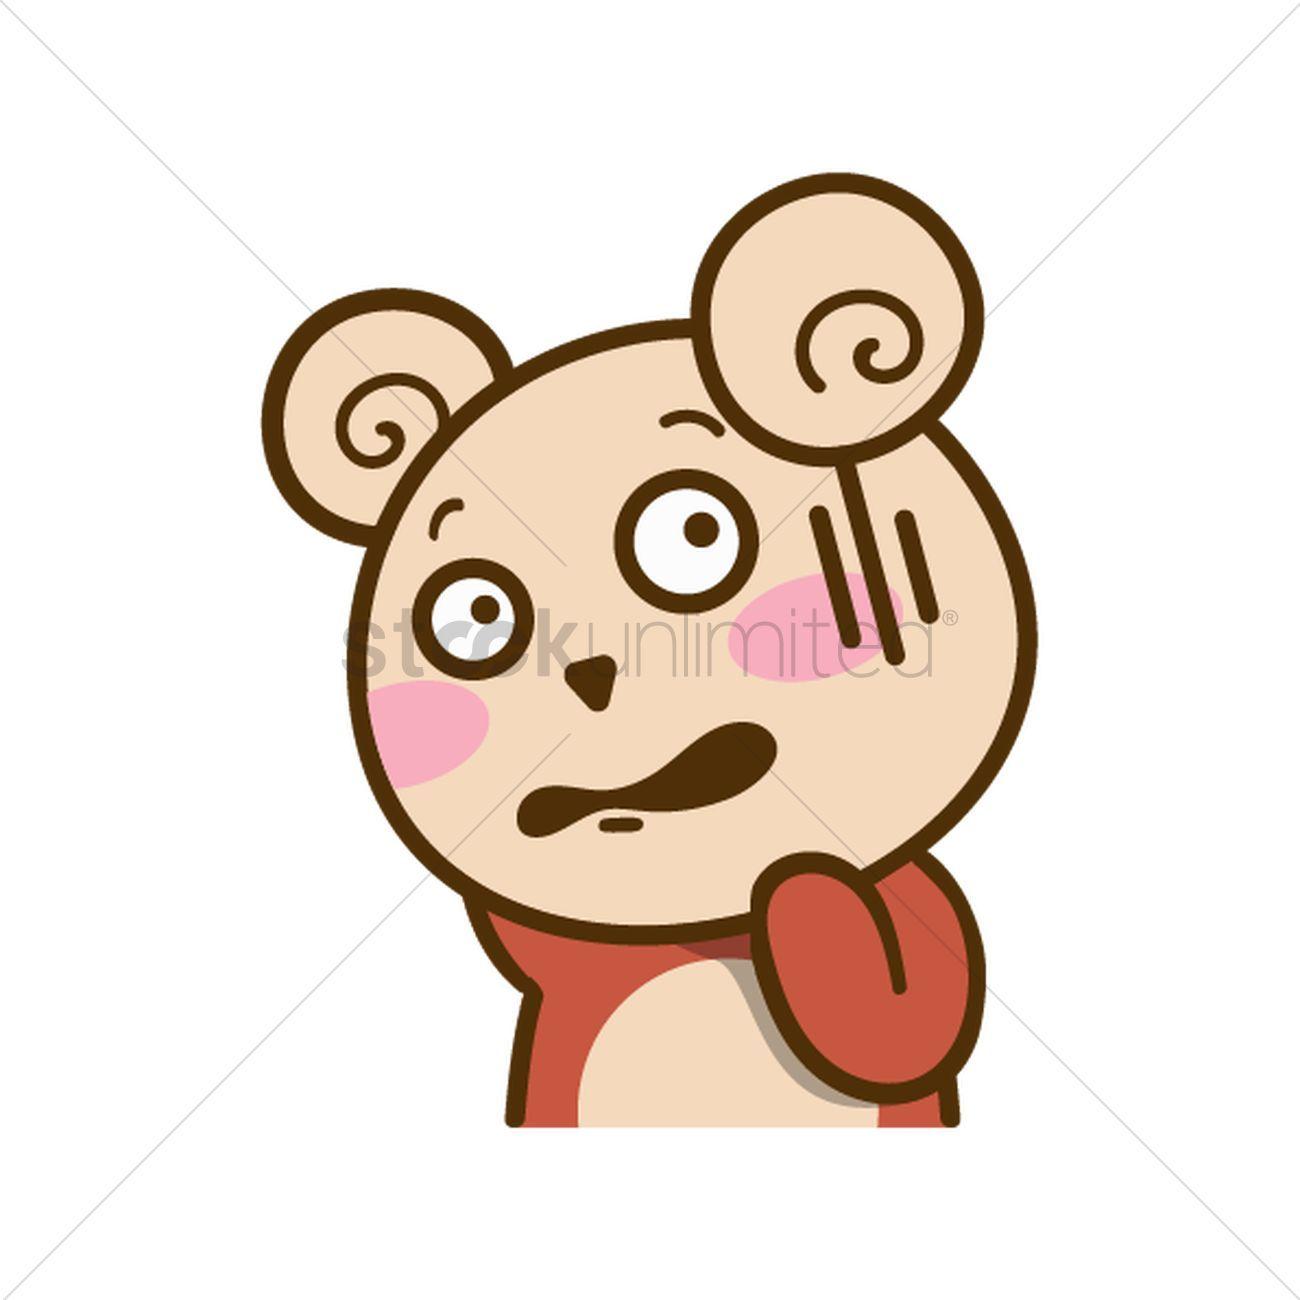 Cartoon bear feeling worried vectors, stock clipart.